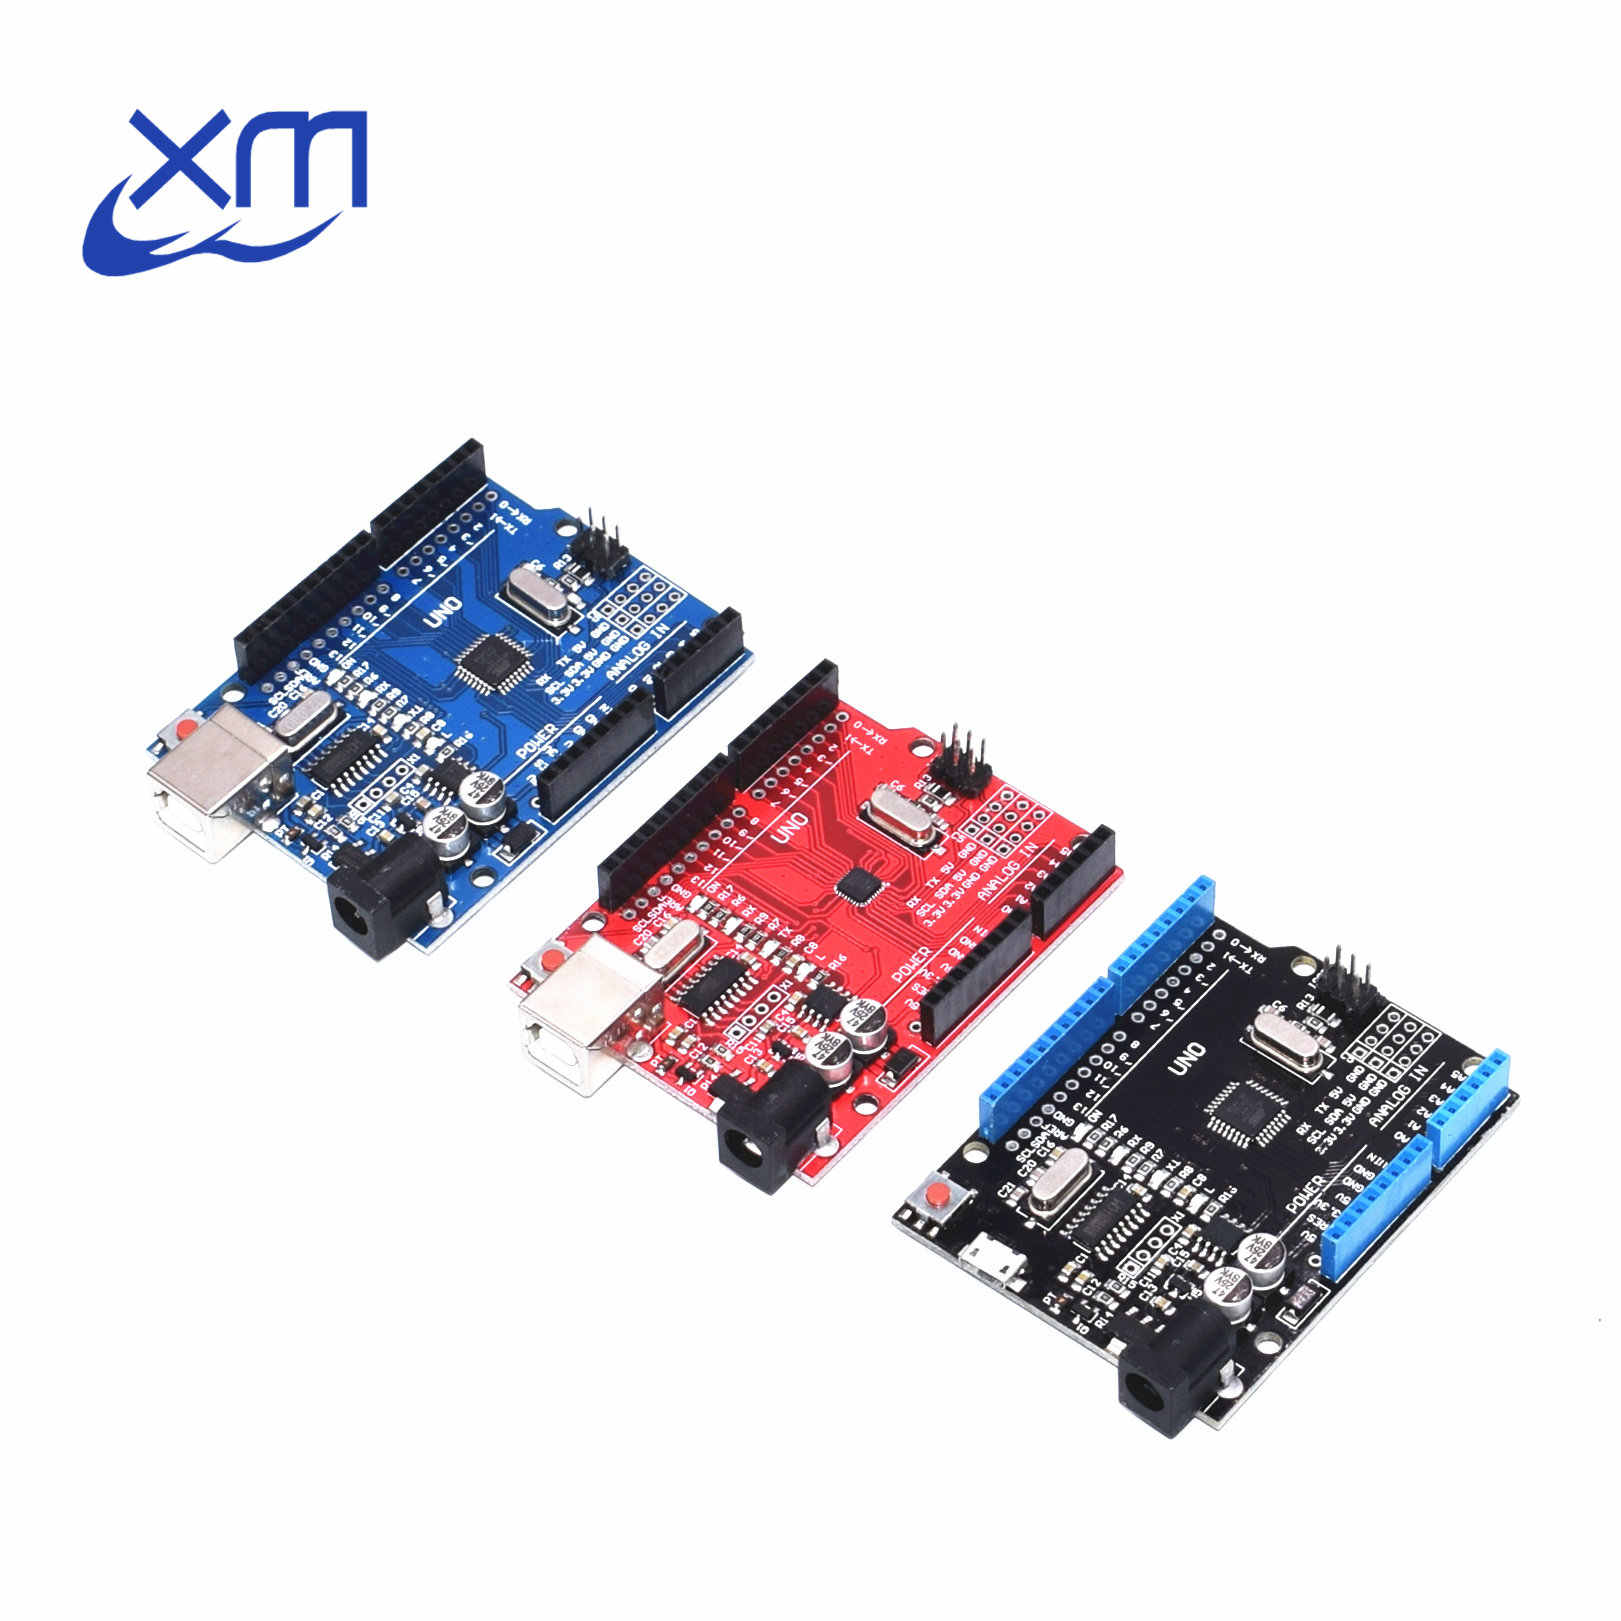 Un ensemble UNO R3 CH340G + MEGA328P ATMEGA16U2 câble USB 2.4 TFT écran LCD puce 16Mhz UNO R3 boad UNO Proto bouclier pour Arduino